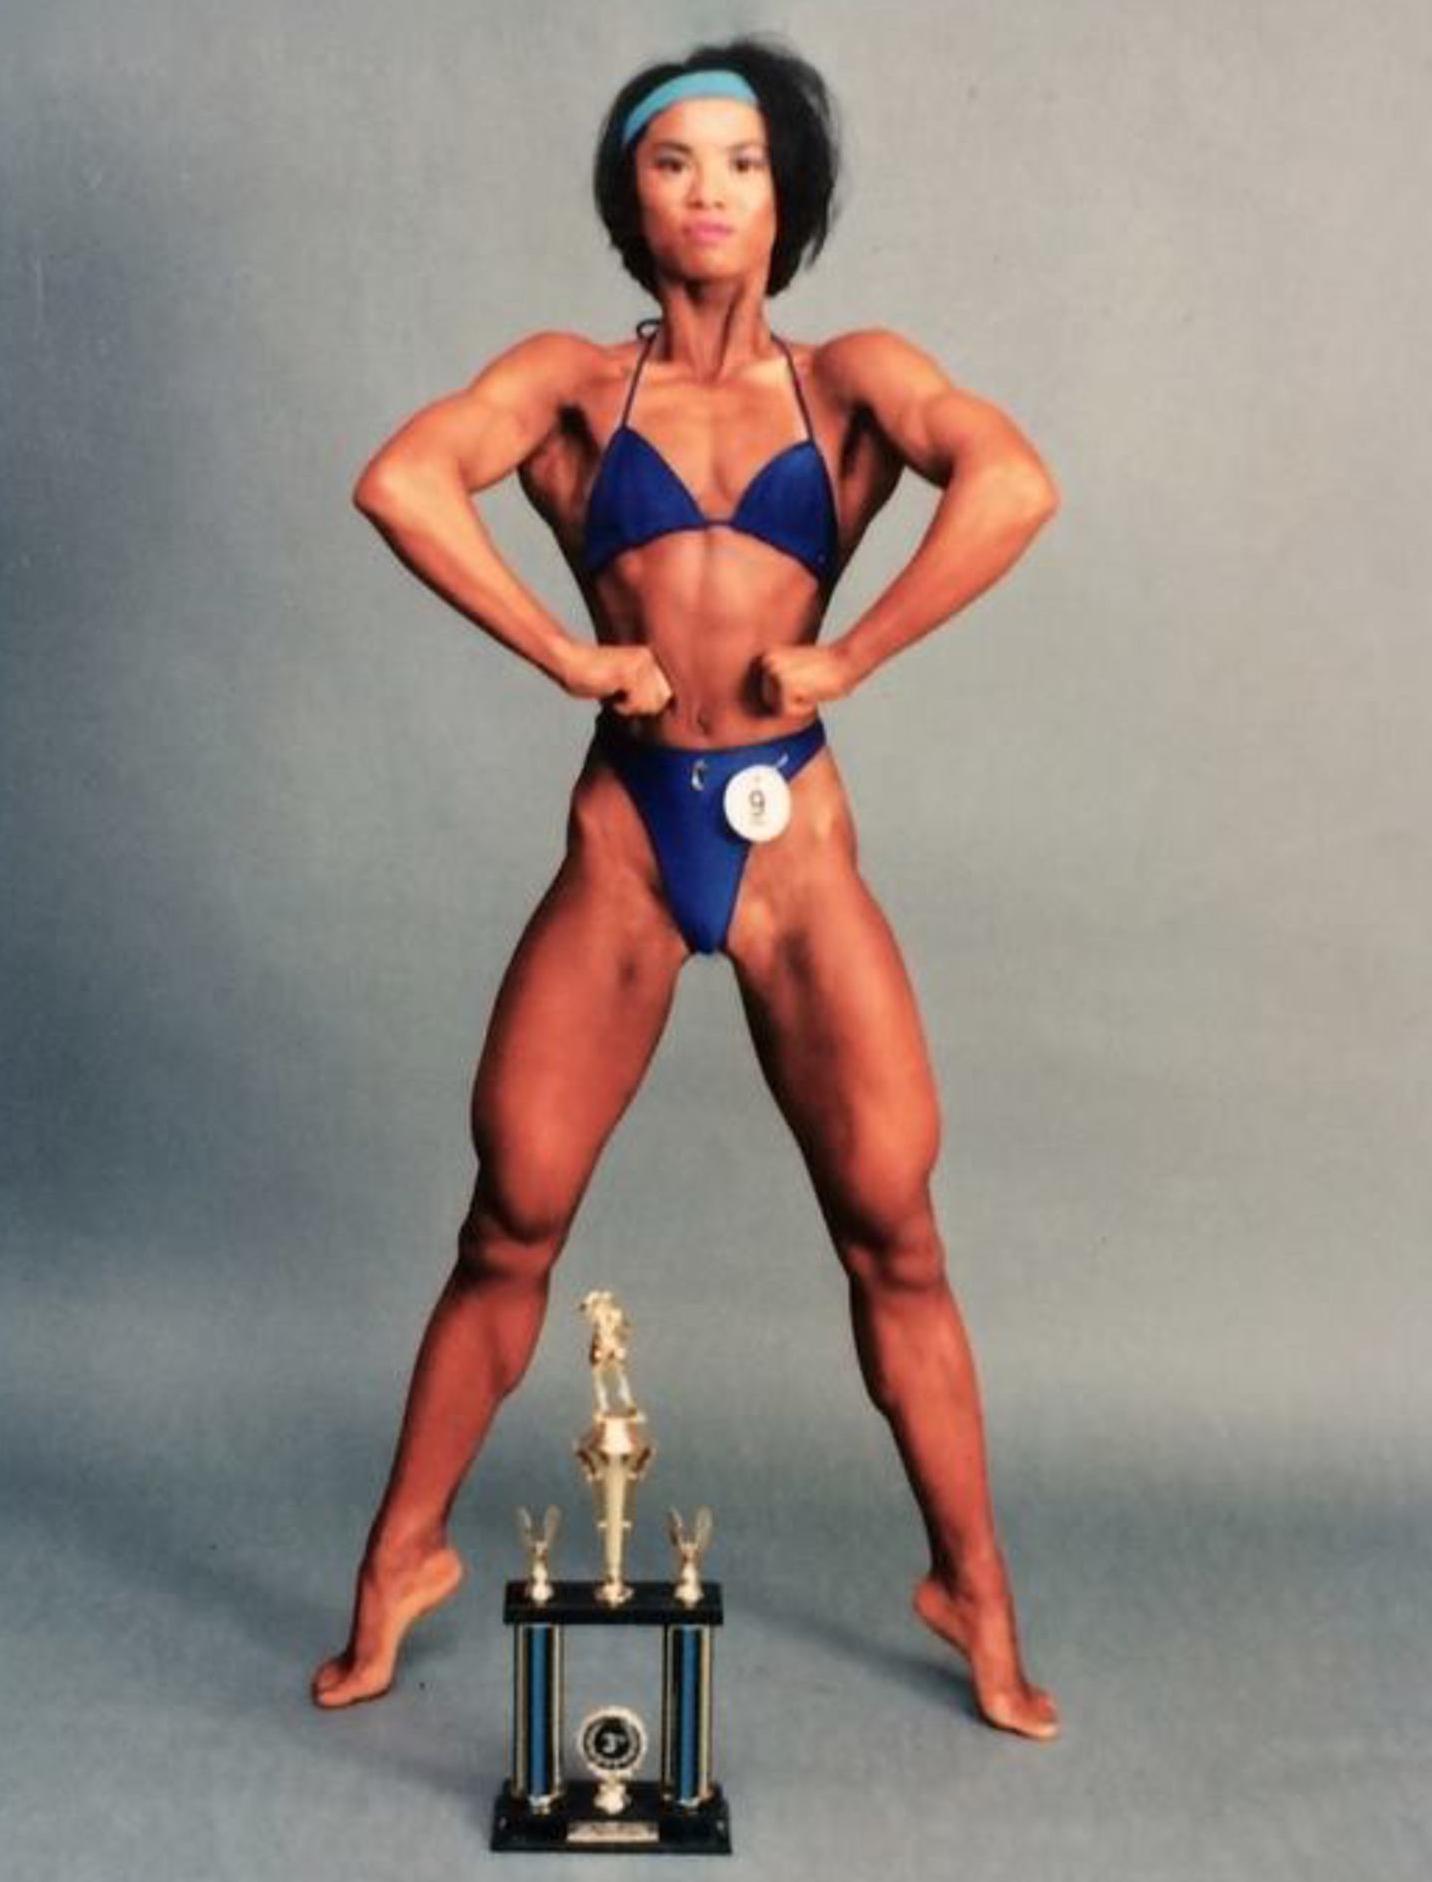 Amazin LeThi - Award winning bodybuilder